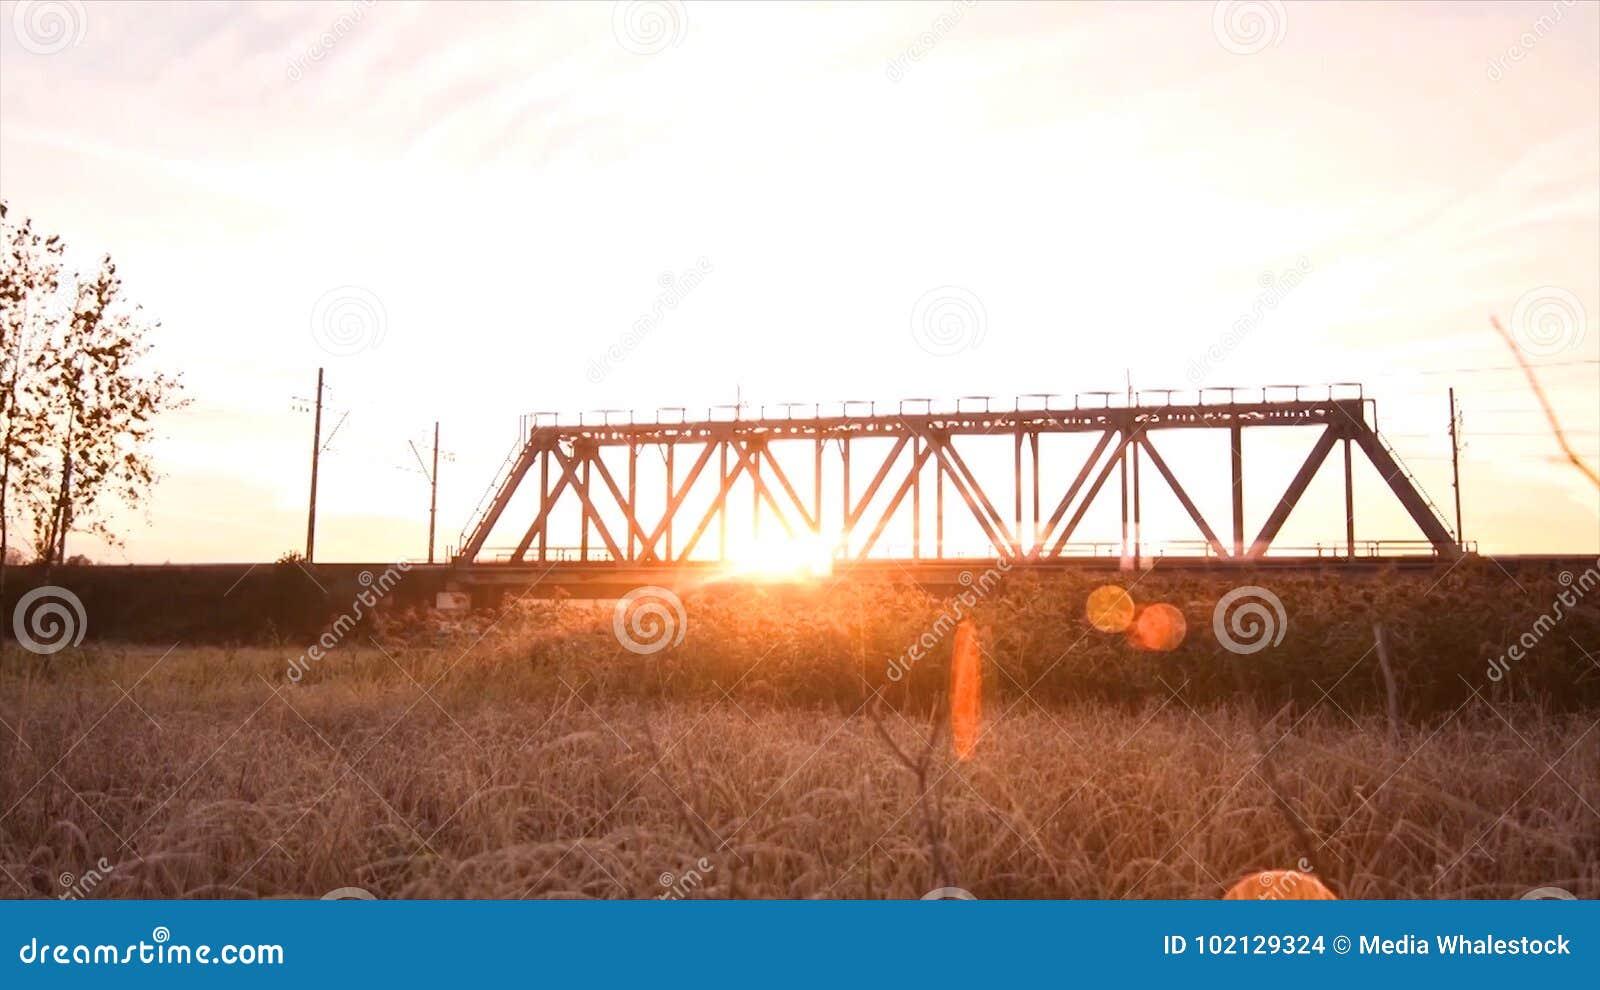 Bridge road. Train traffic transportation. Timelapse railway bridge on sunrise